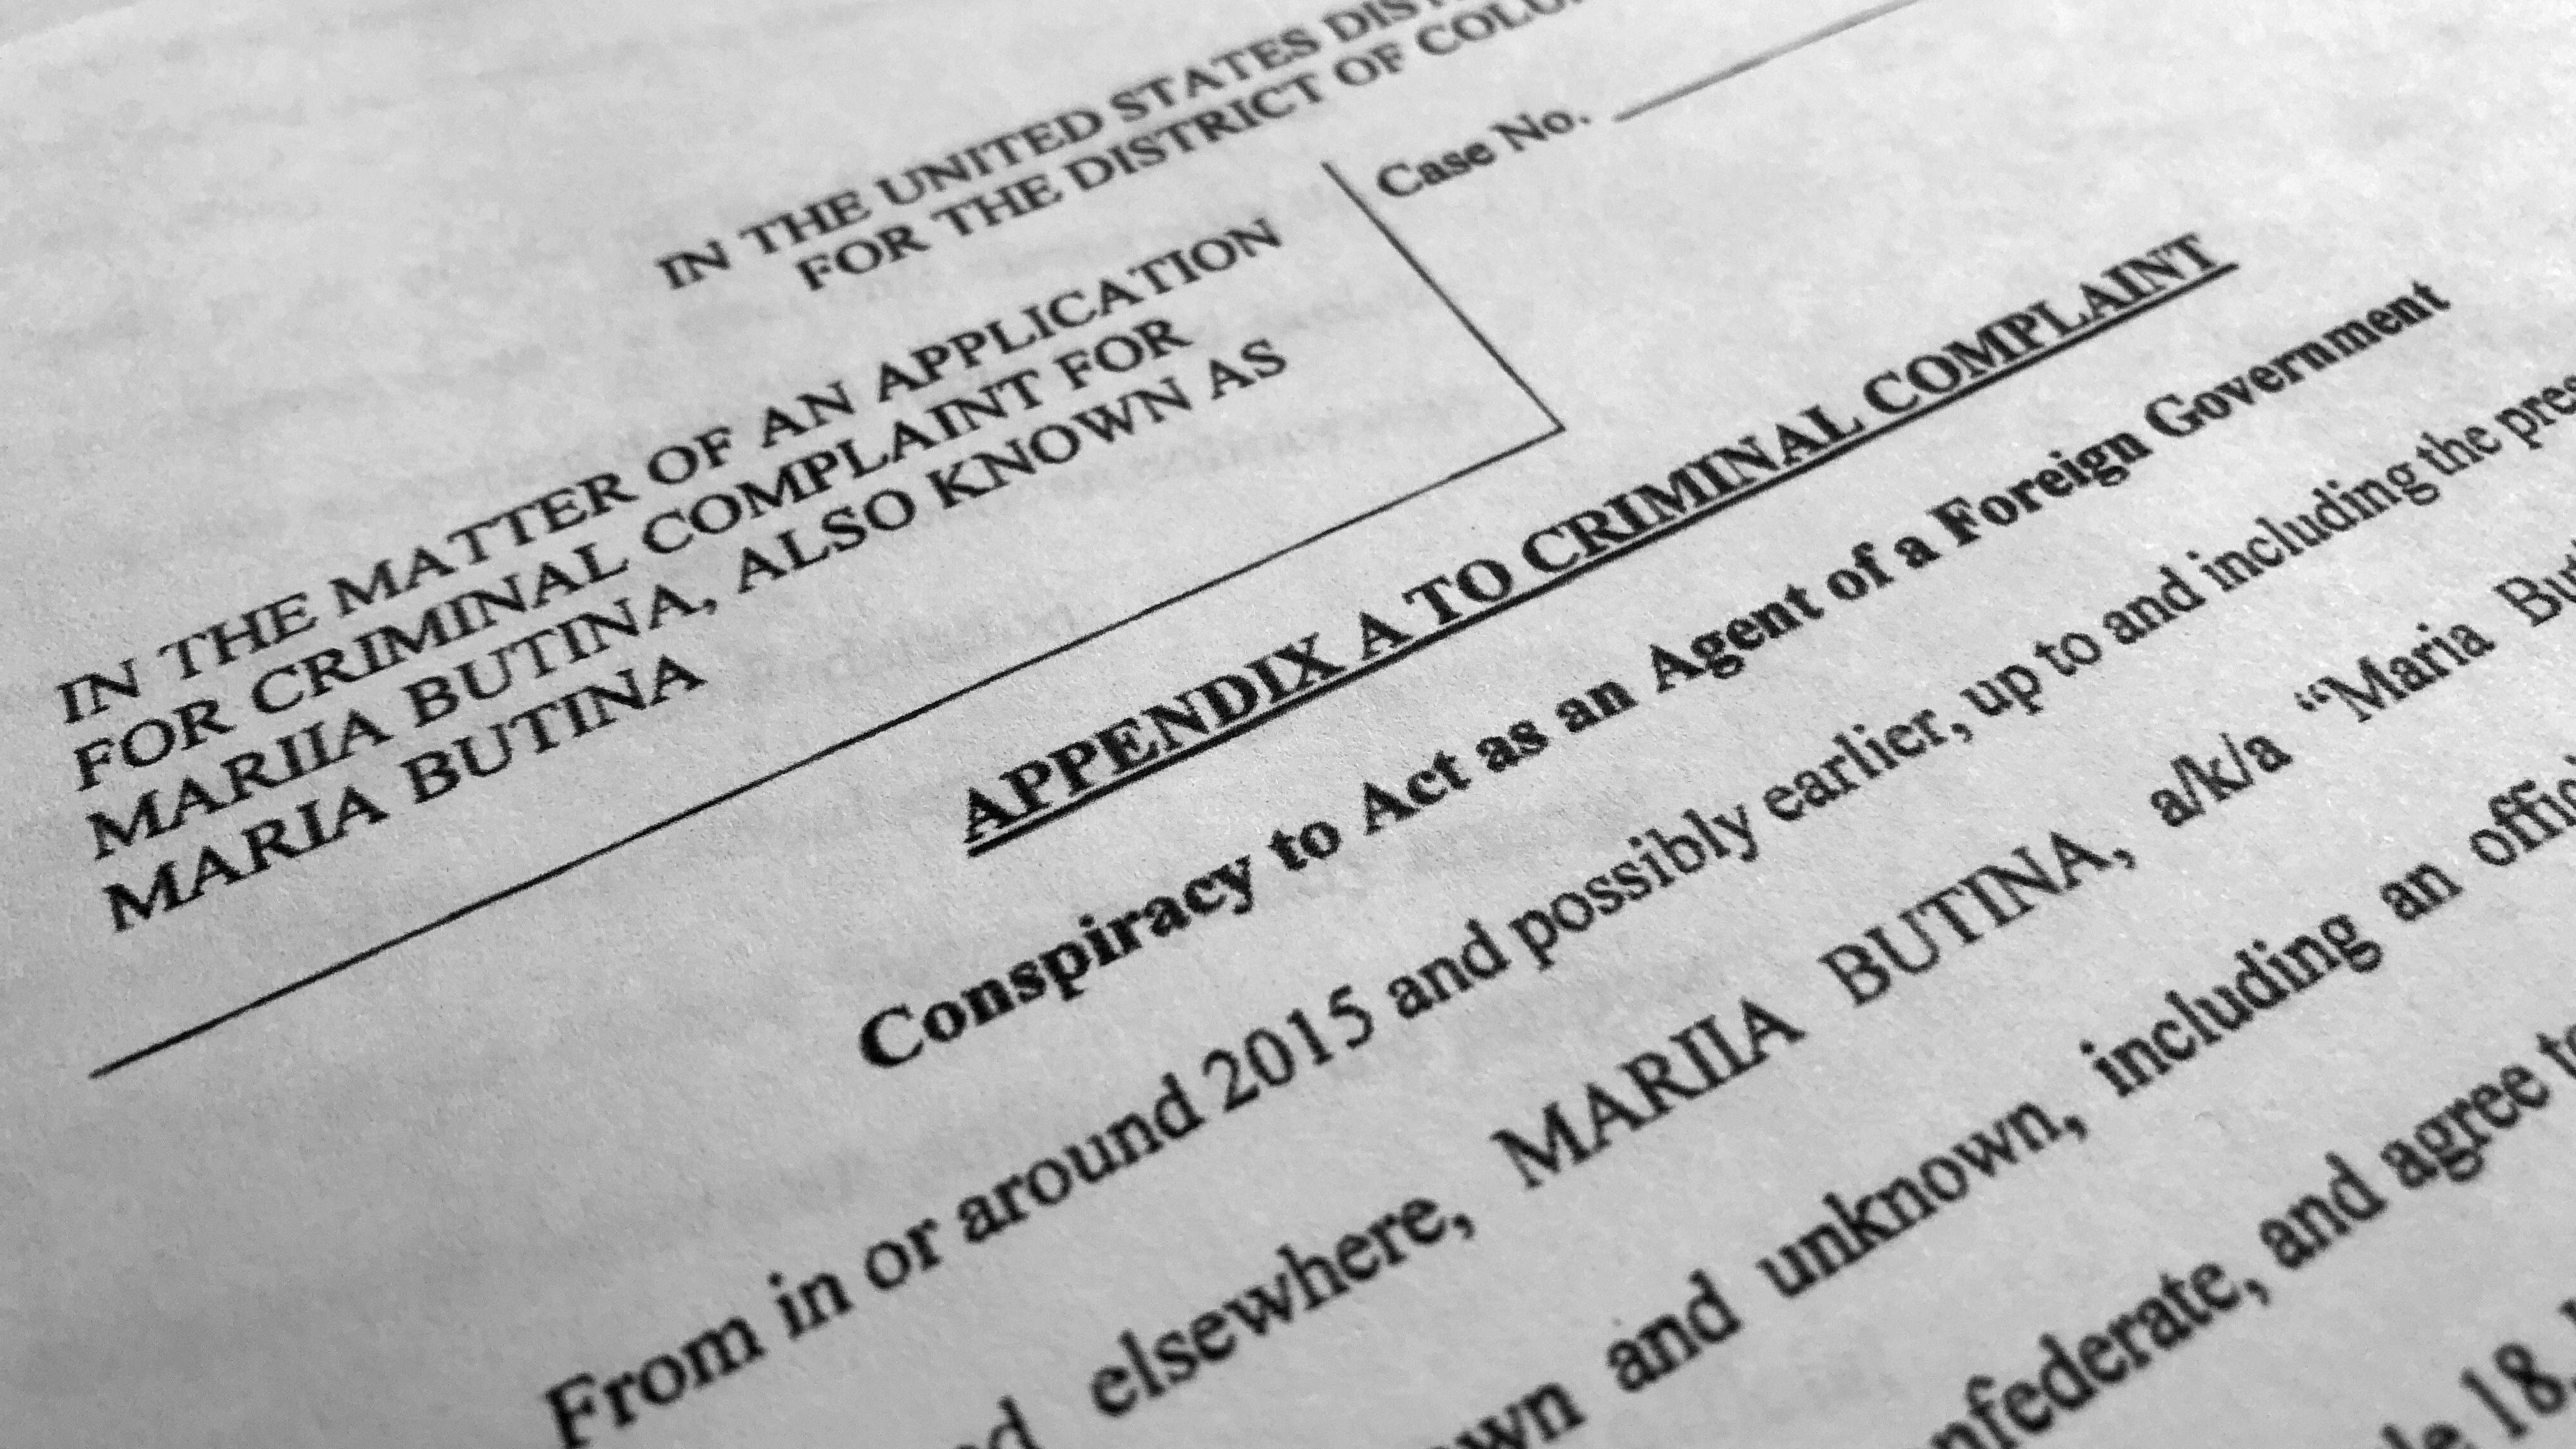 The DOJ charged Maria Butina for spying